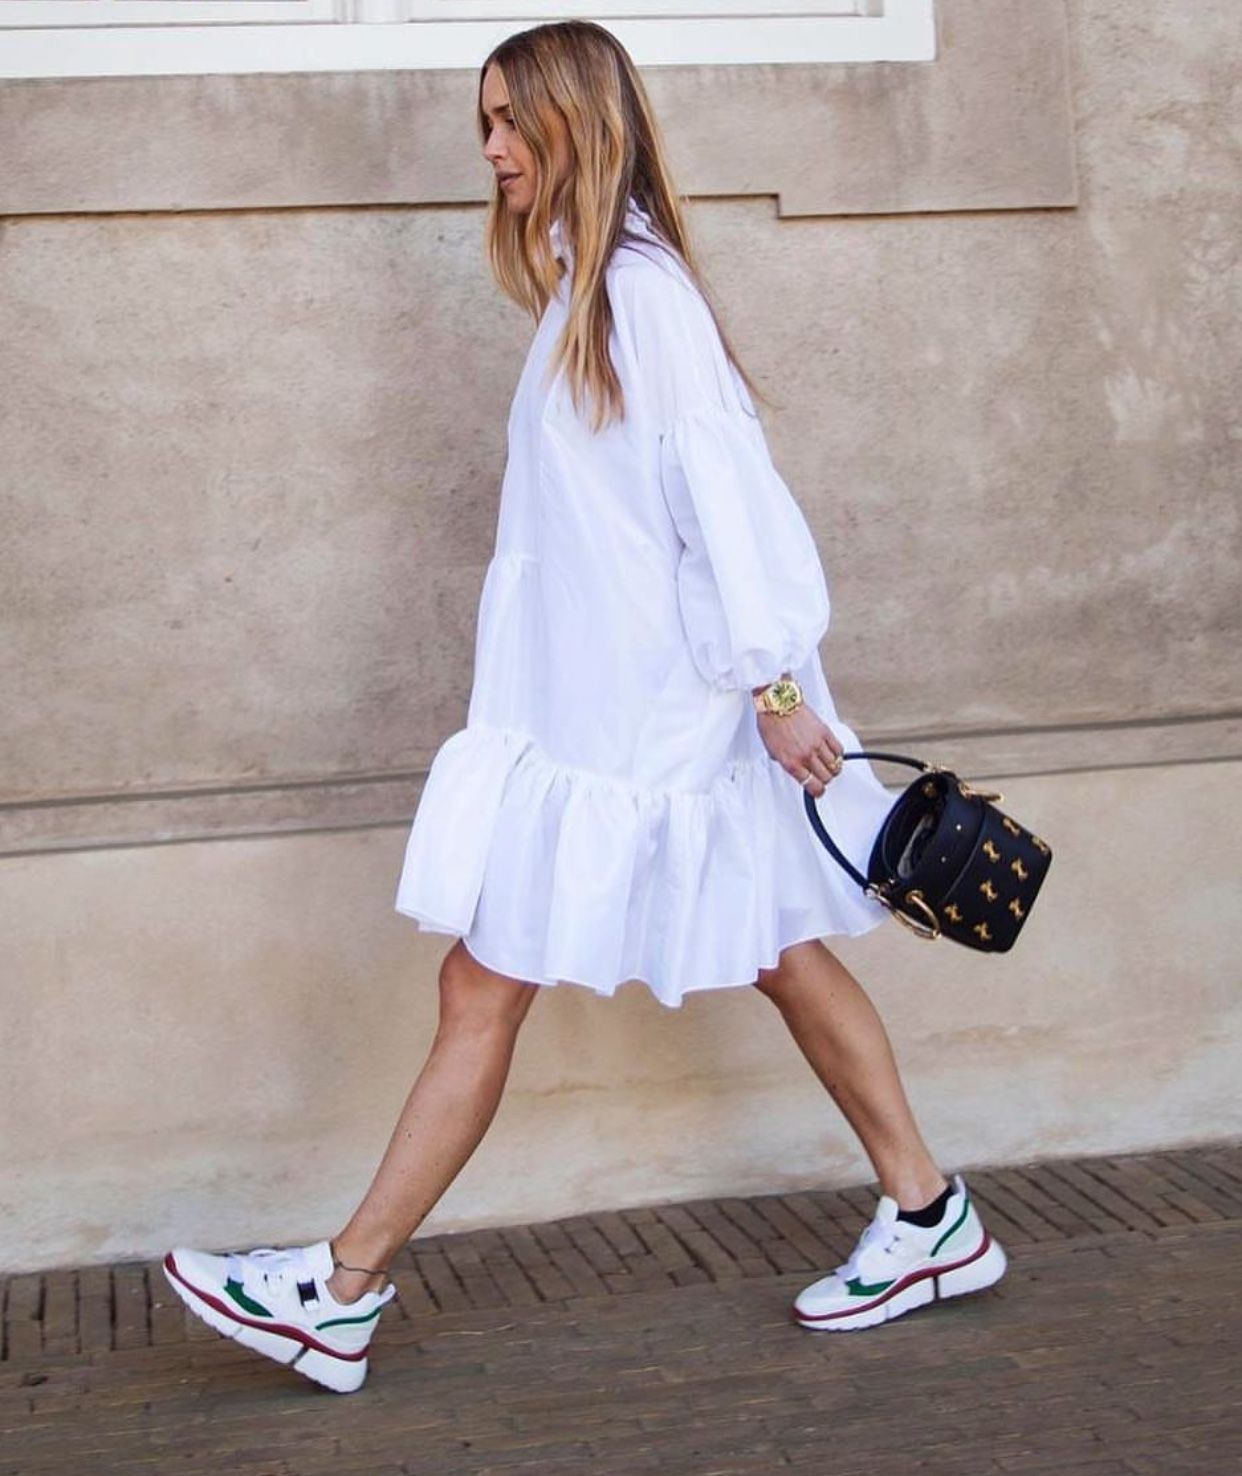 Street style dress